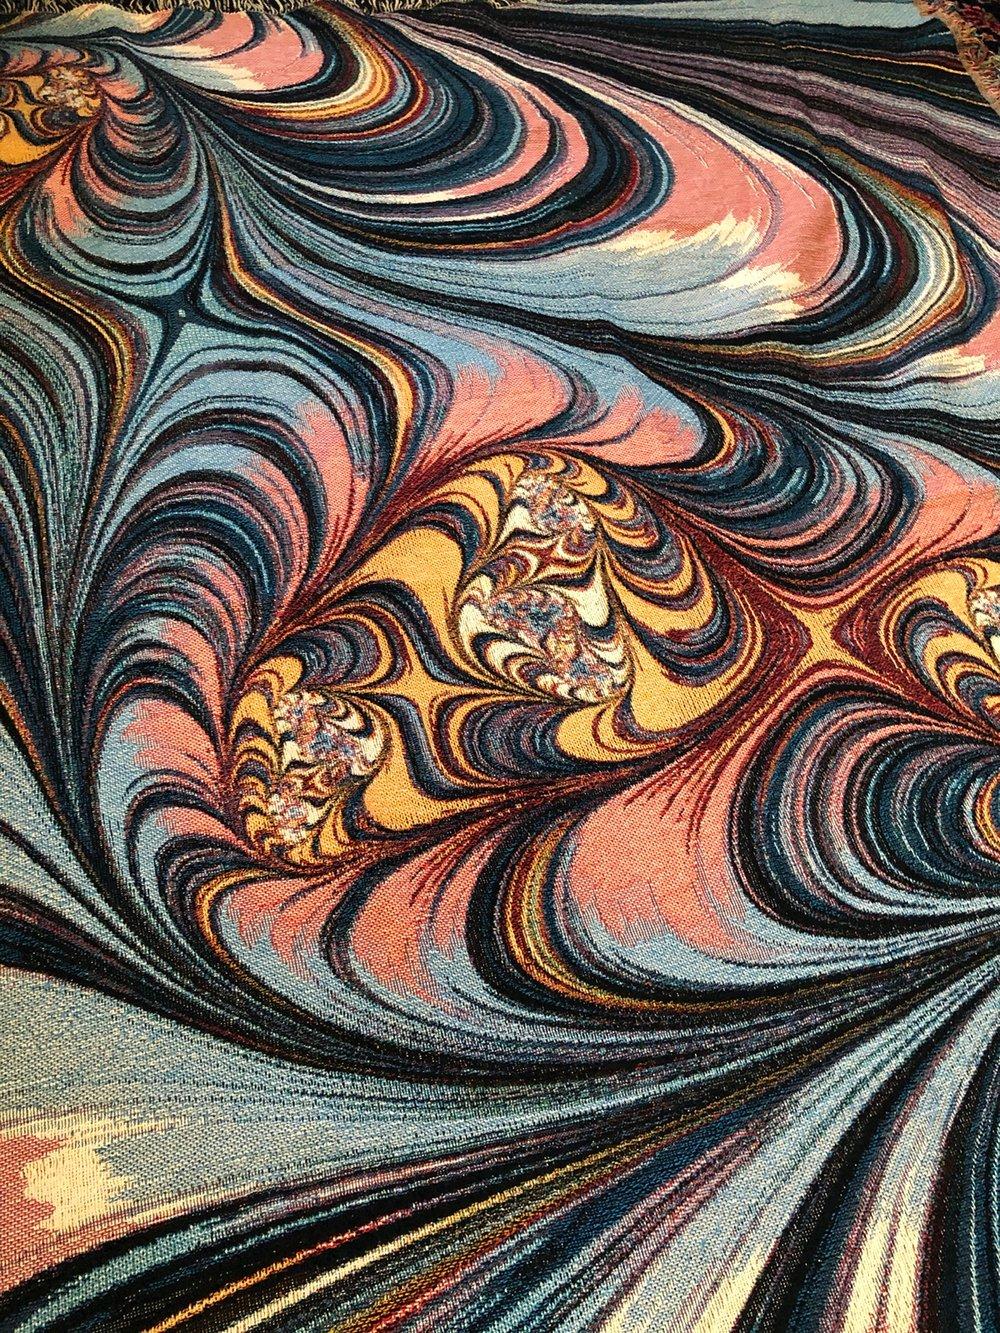 Woven Blanket #22